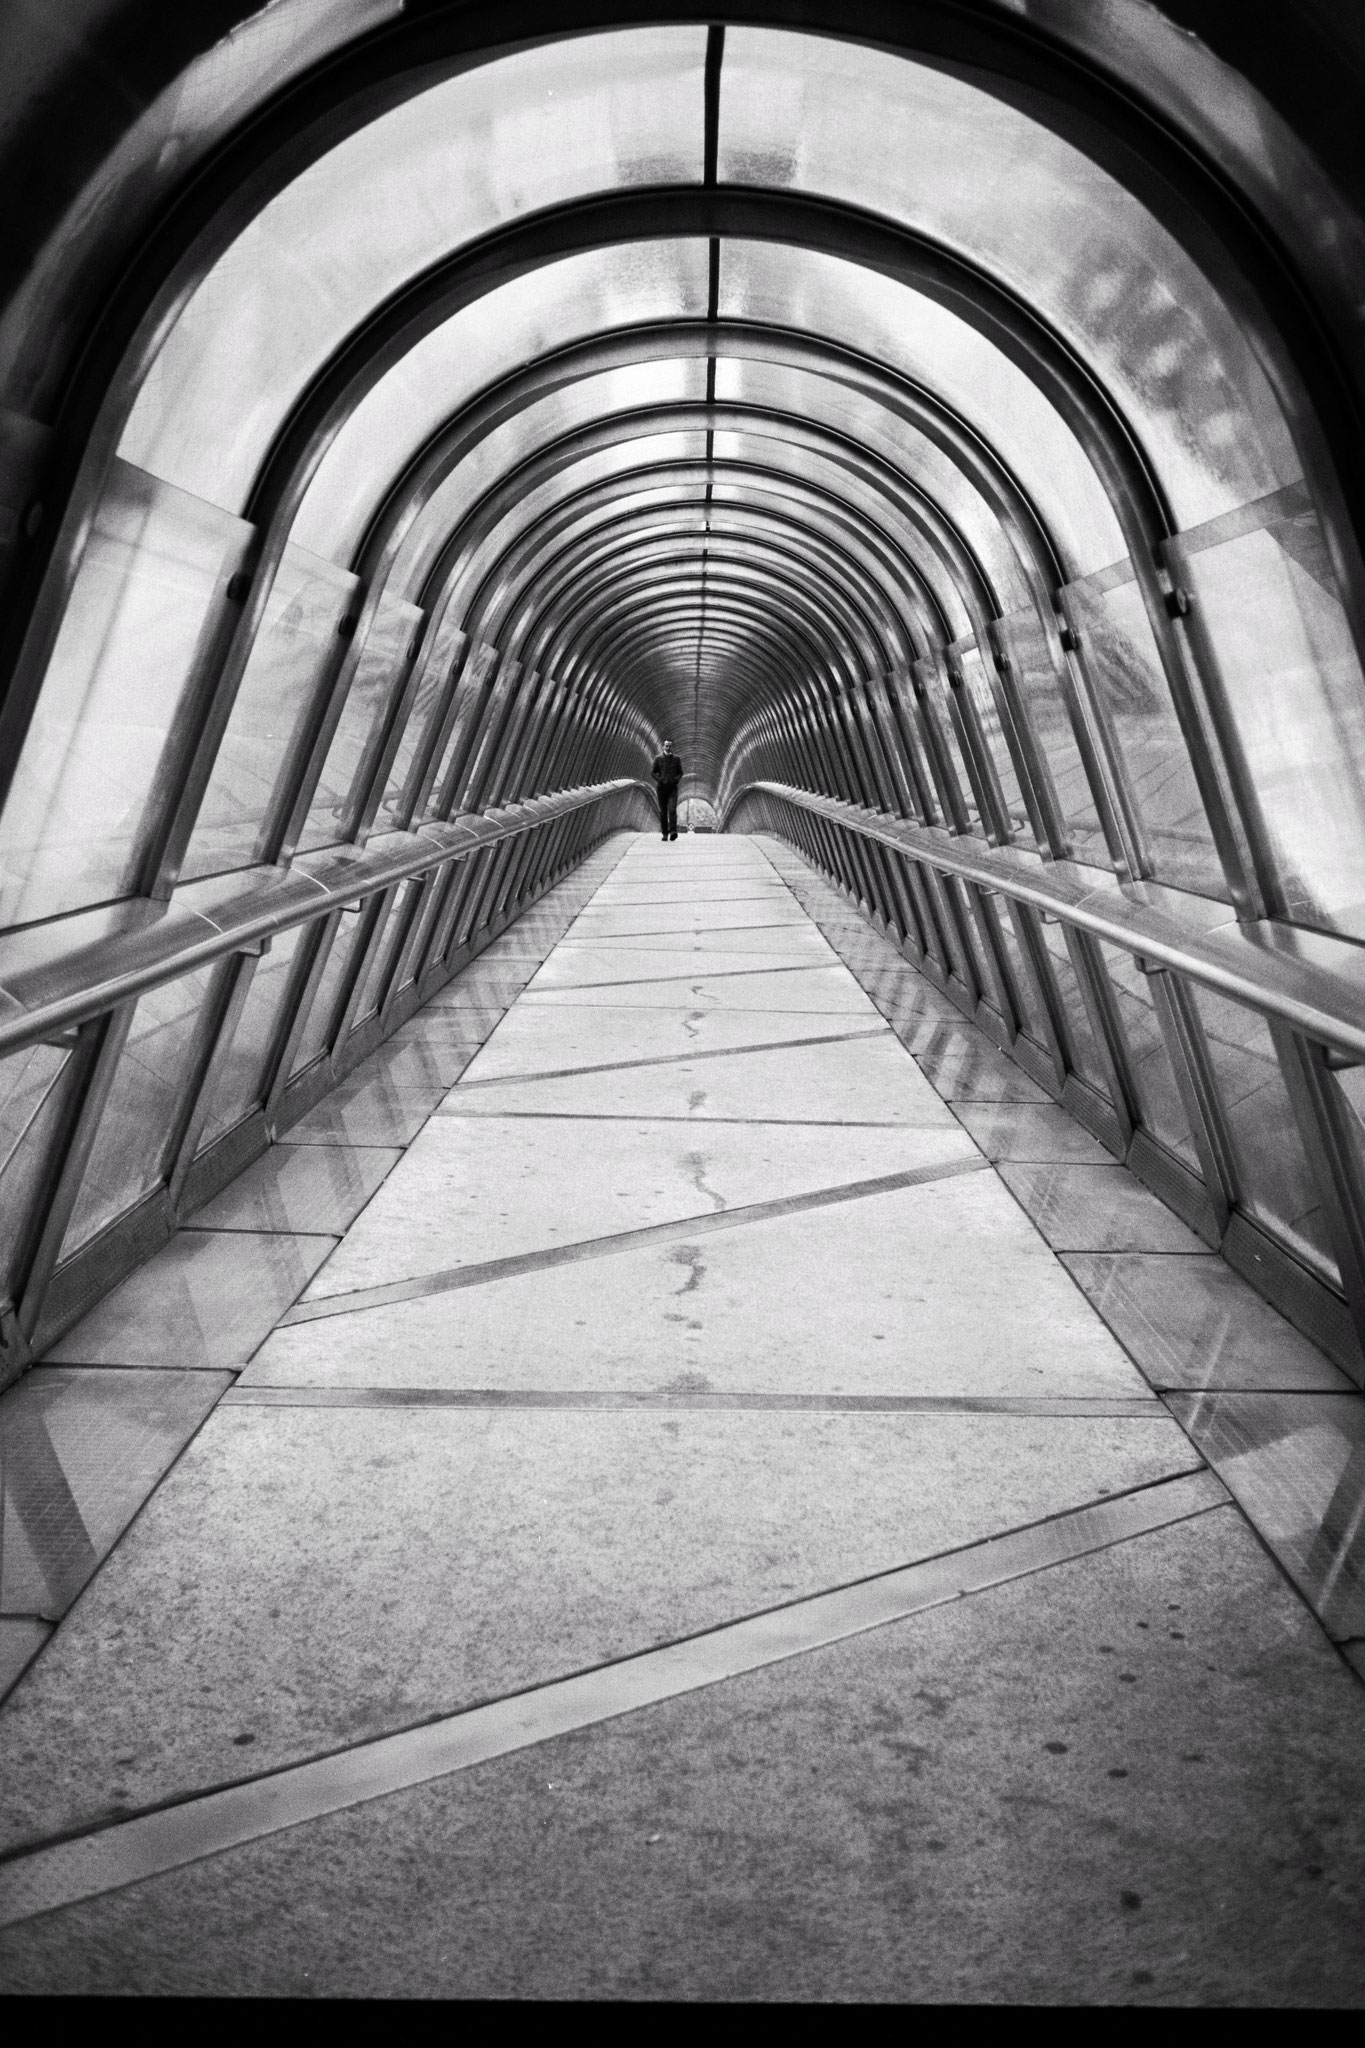 """Perspective game"" - La Défense (2021). Rollei Blackbird Creative 64 ASA. © Clémence Rougetet"